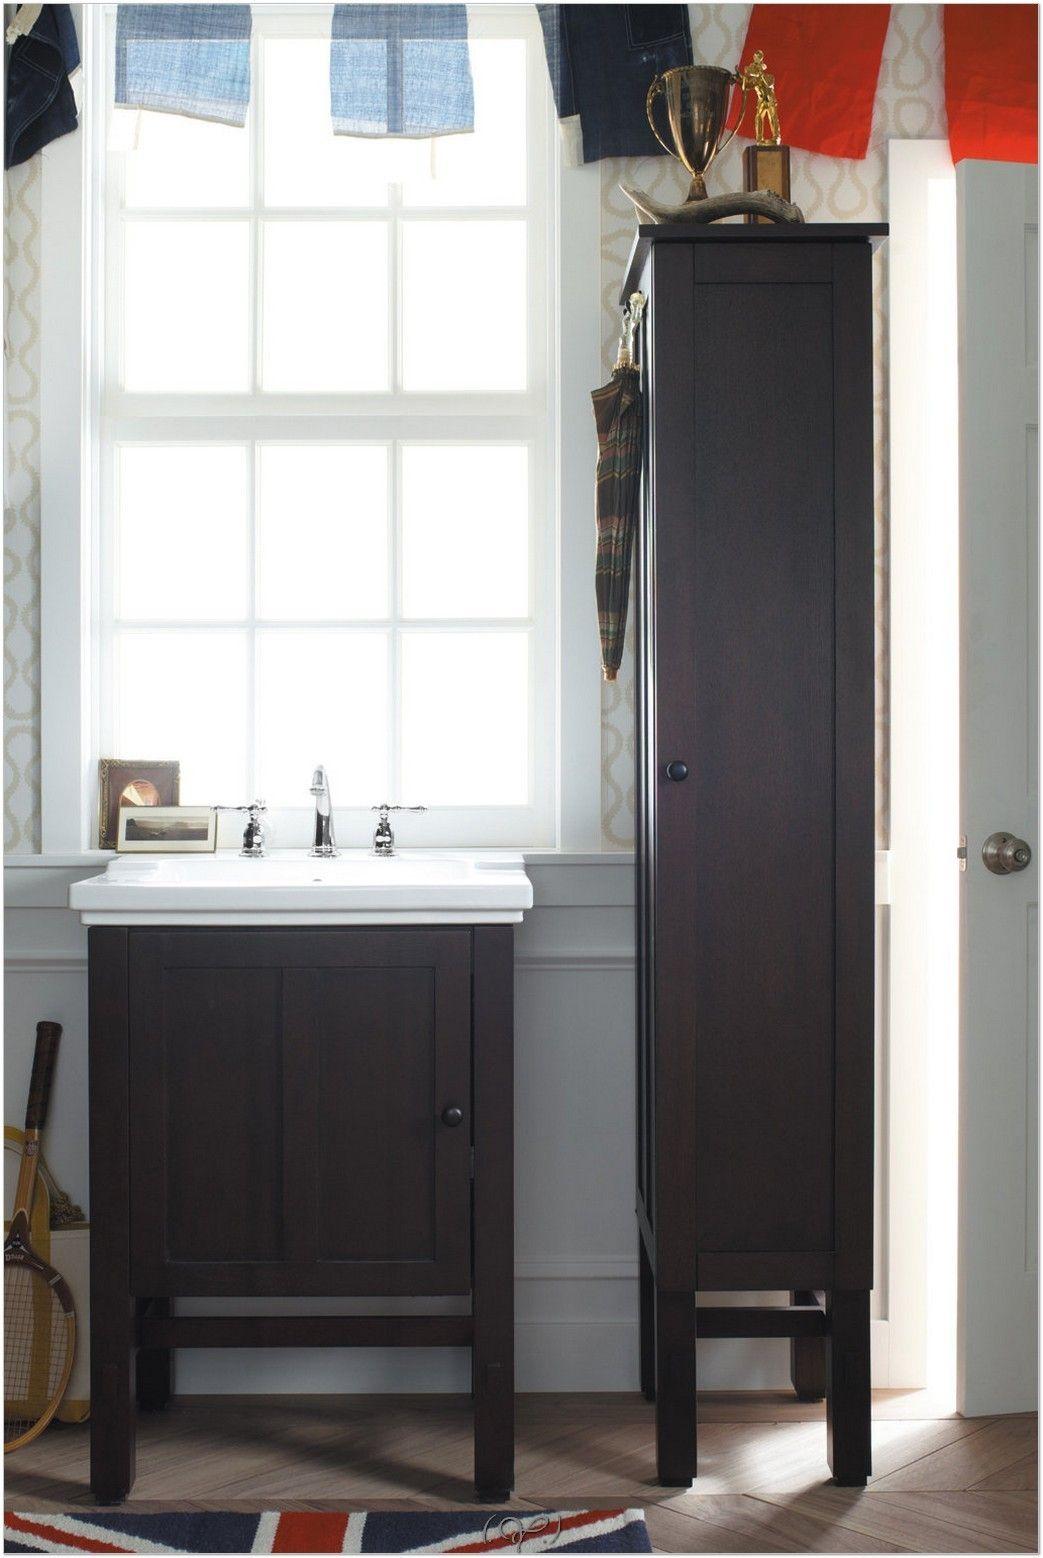 26 Half Bathroom Ideas and Design For Upgrade Your House | Bath ...